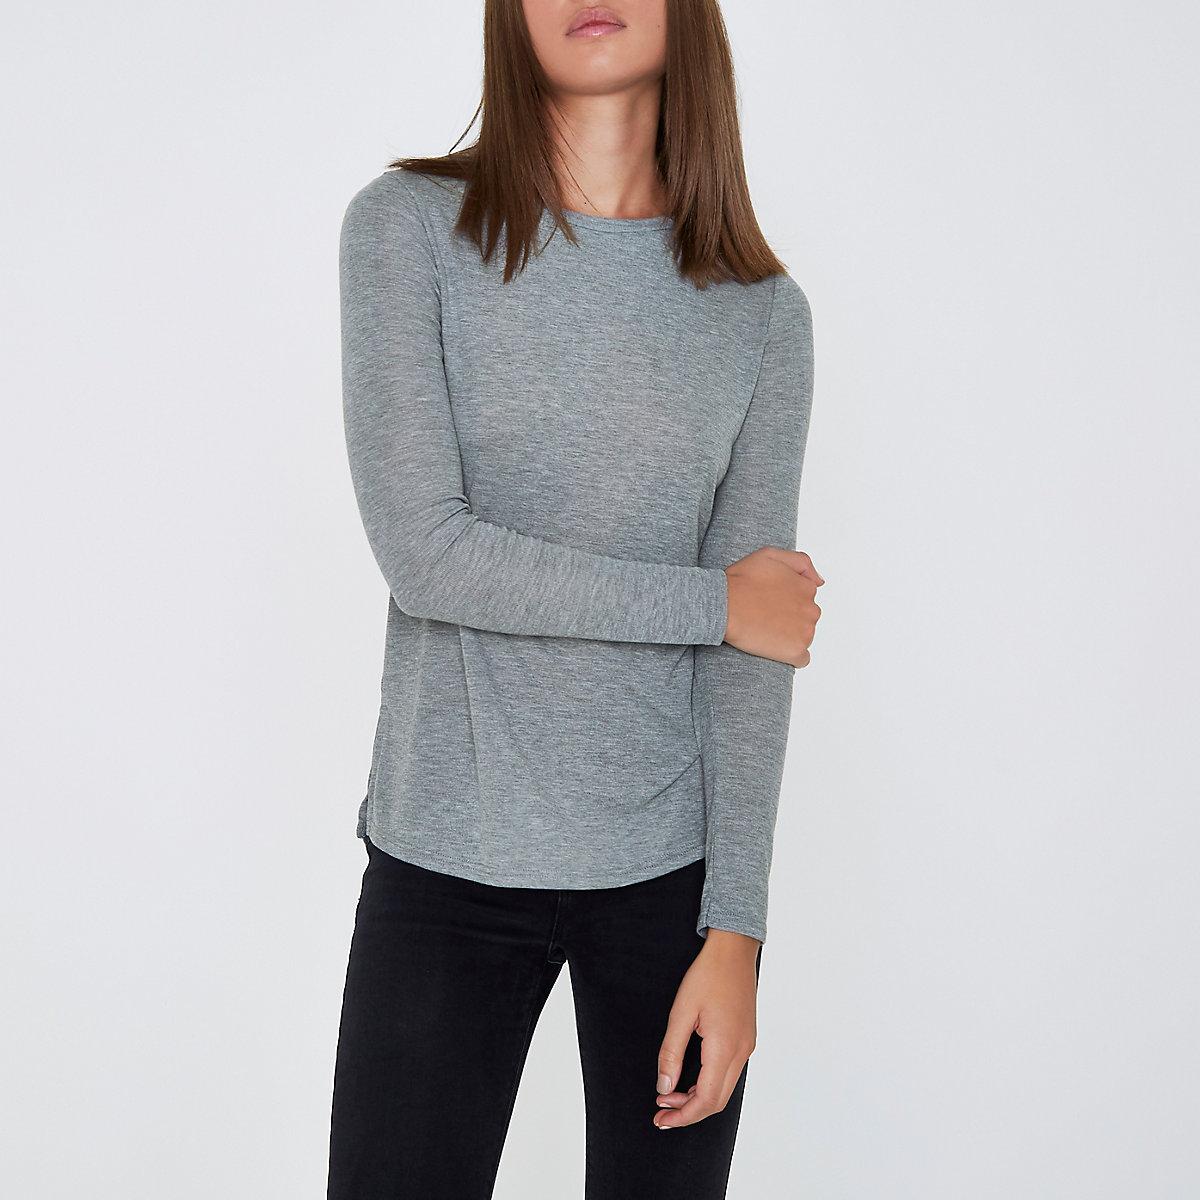 Grey basic long sleeve top